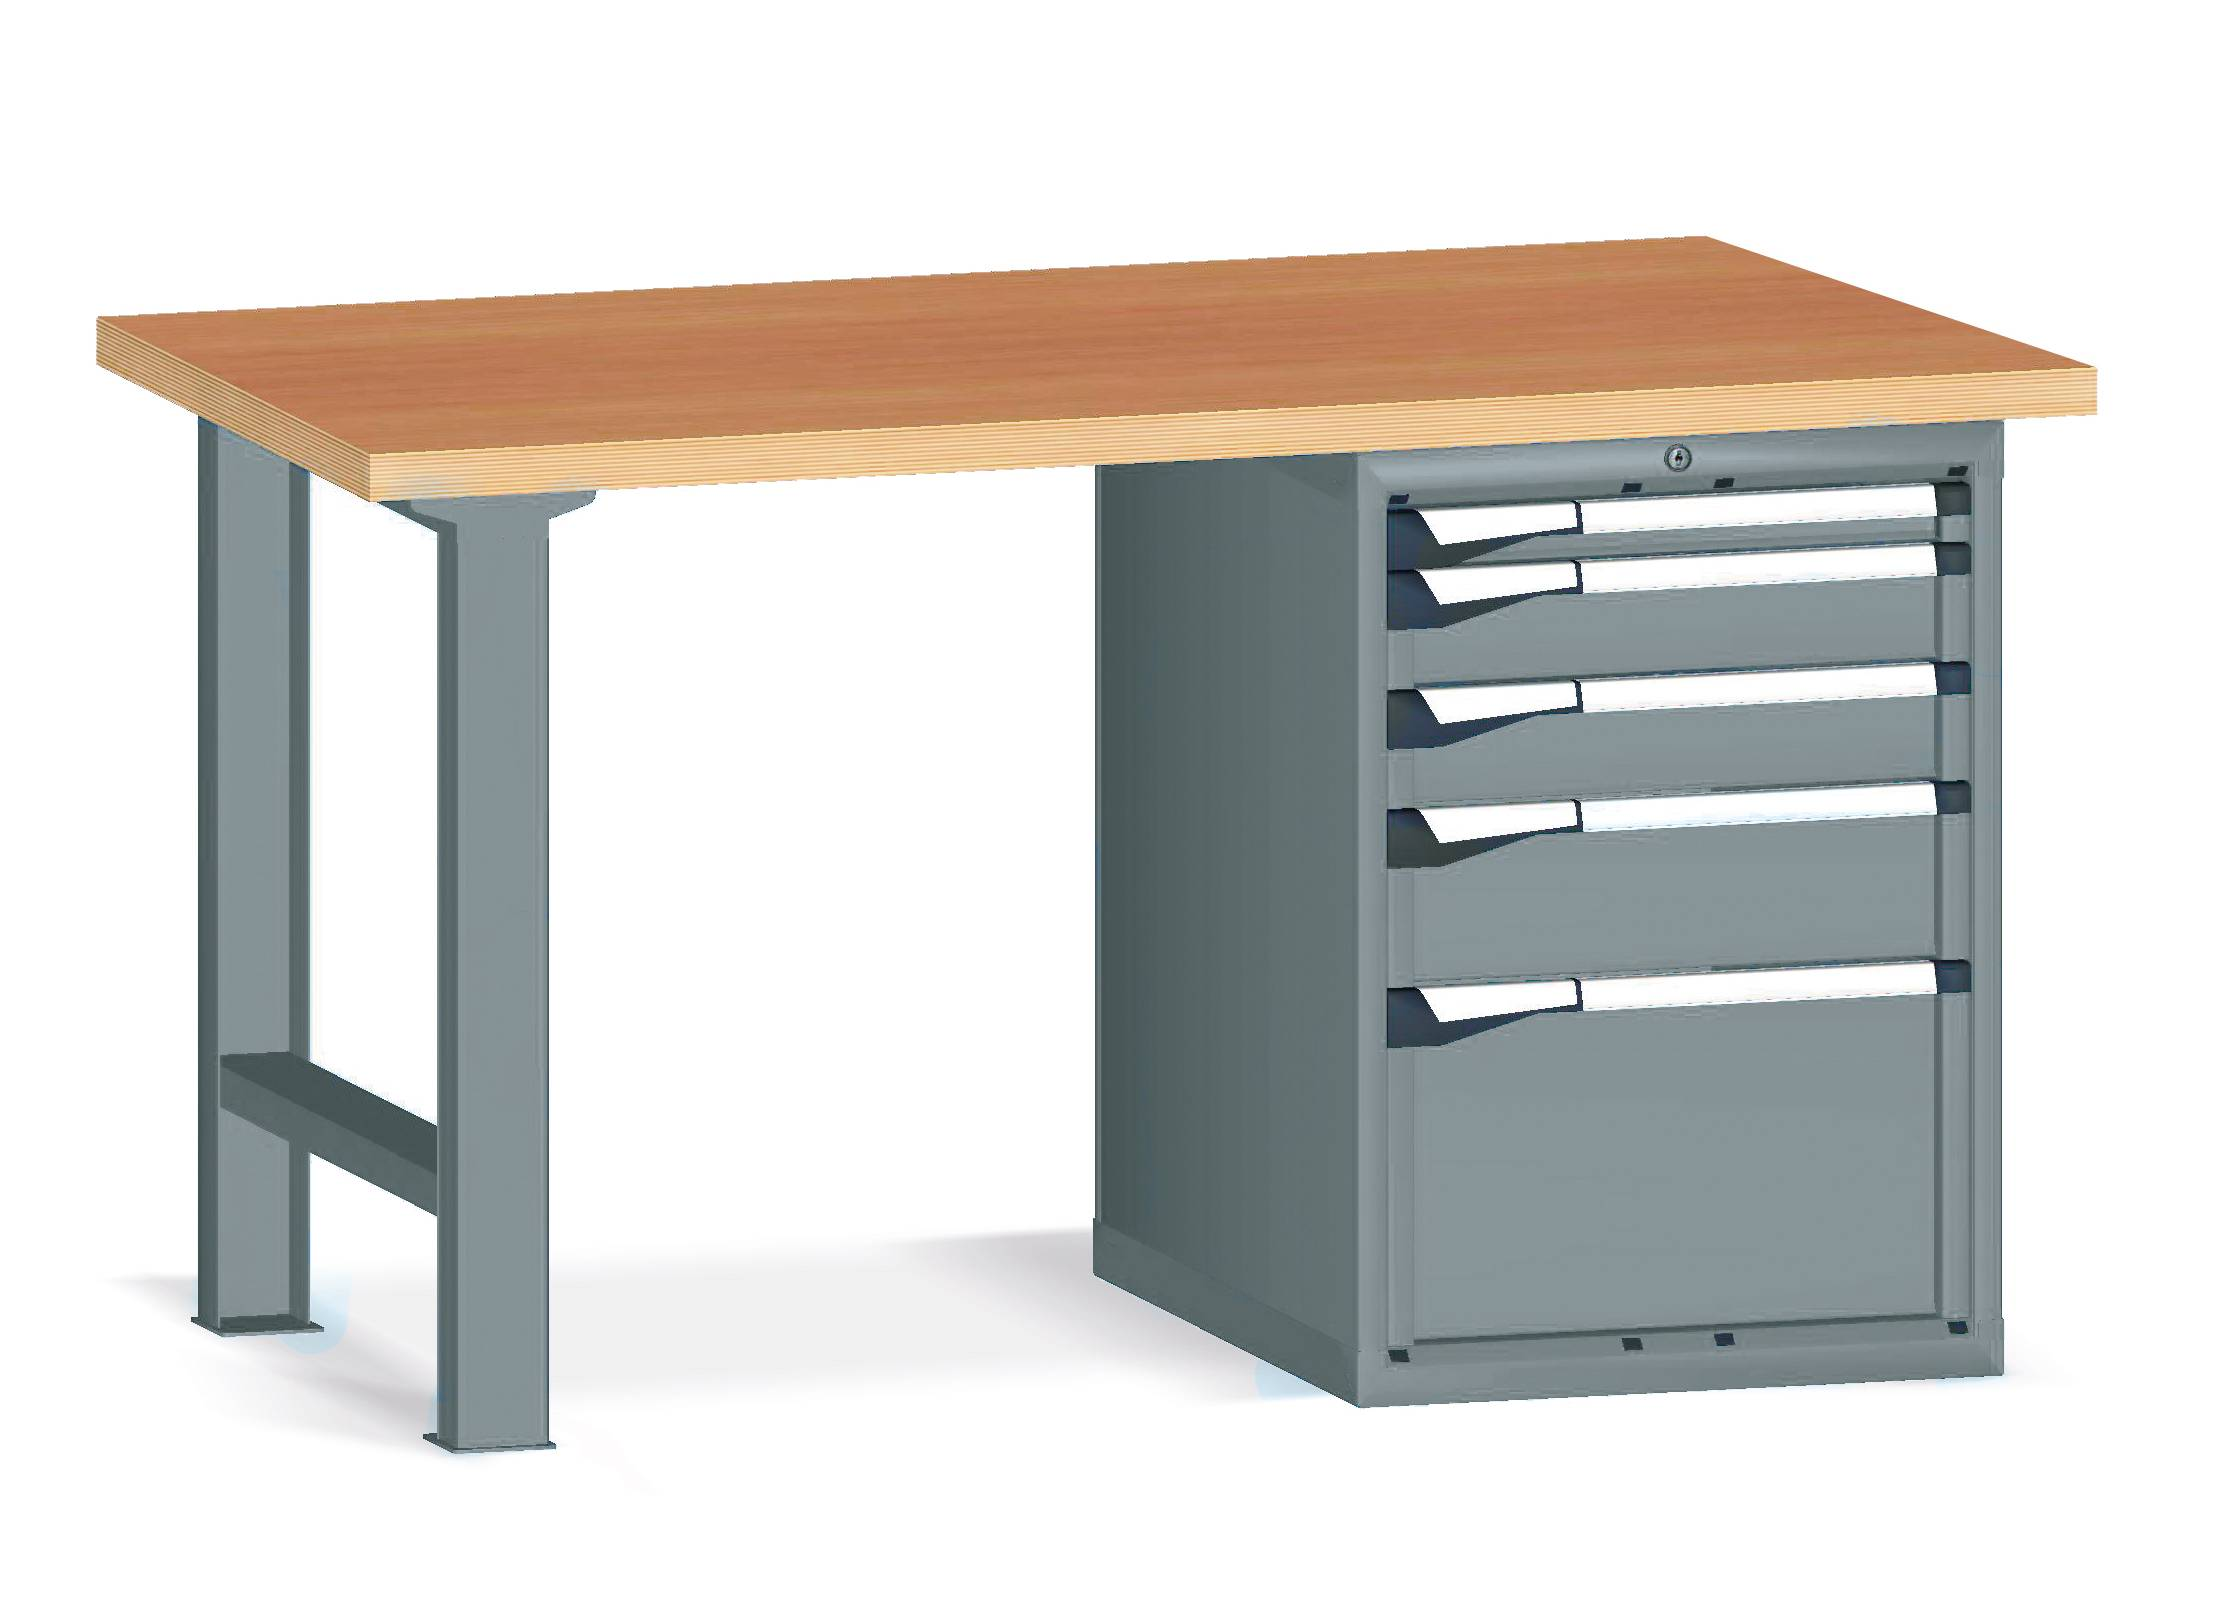 SETAM Etabli d'atelier avec 5 tiroirs - Longueur 2